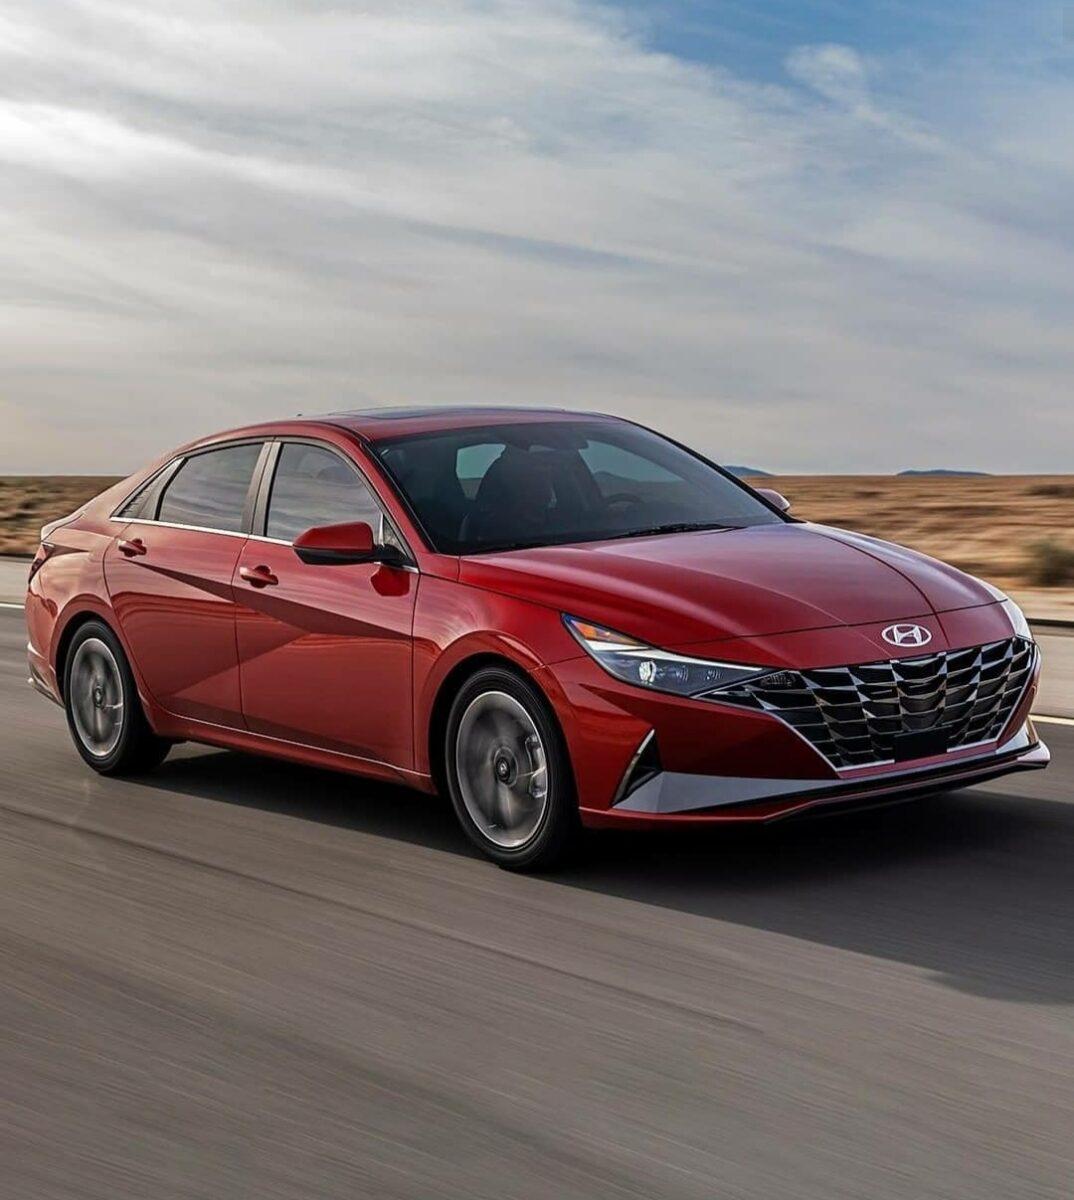 2020 Hyundai Elantra BS6